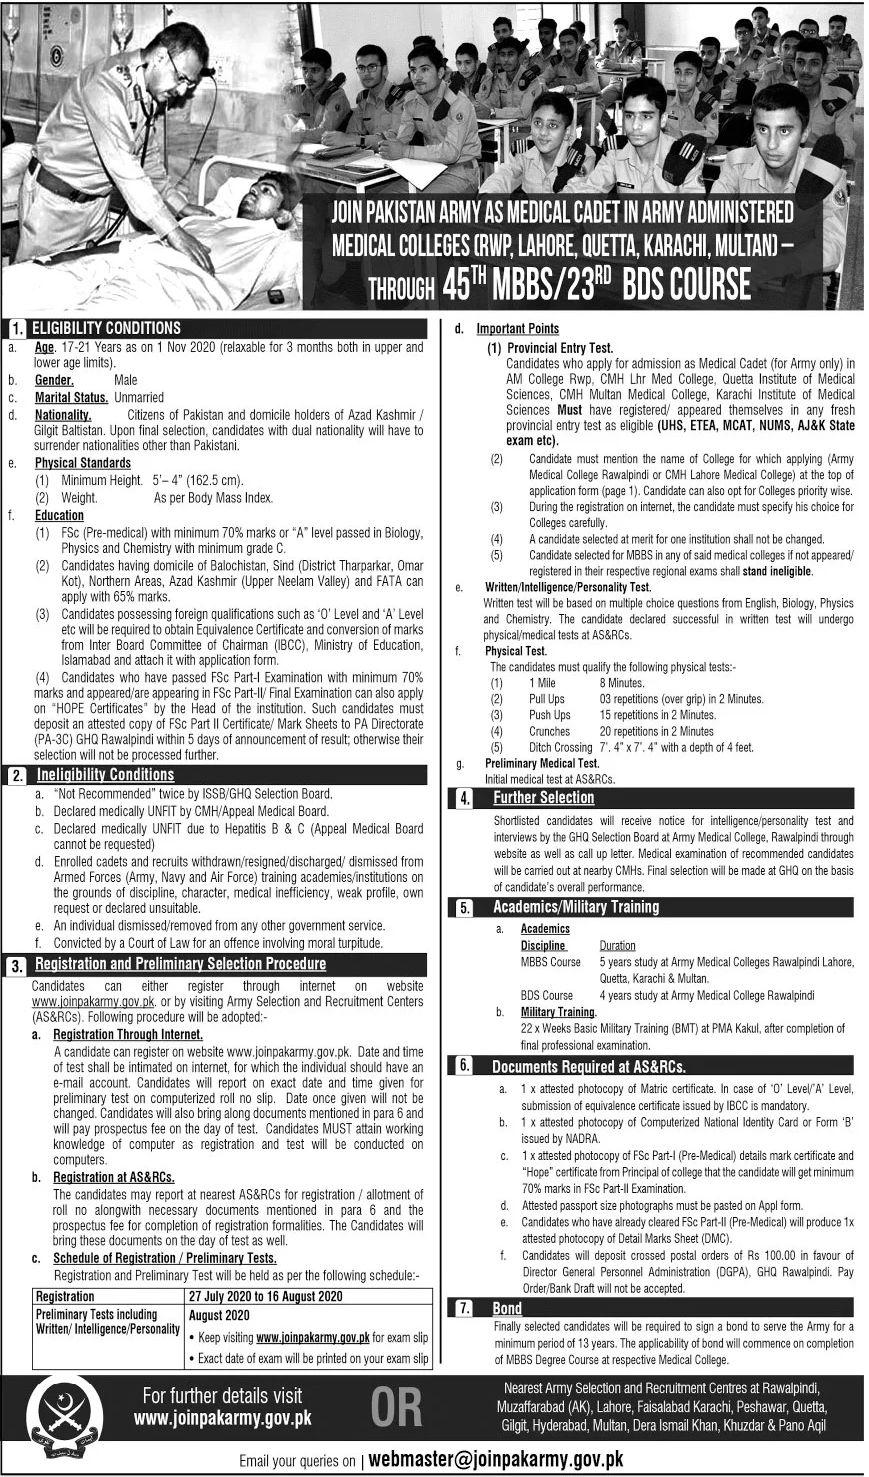 Join-Pakistan-Army-Jobs-as-Medica-cadetl-2020